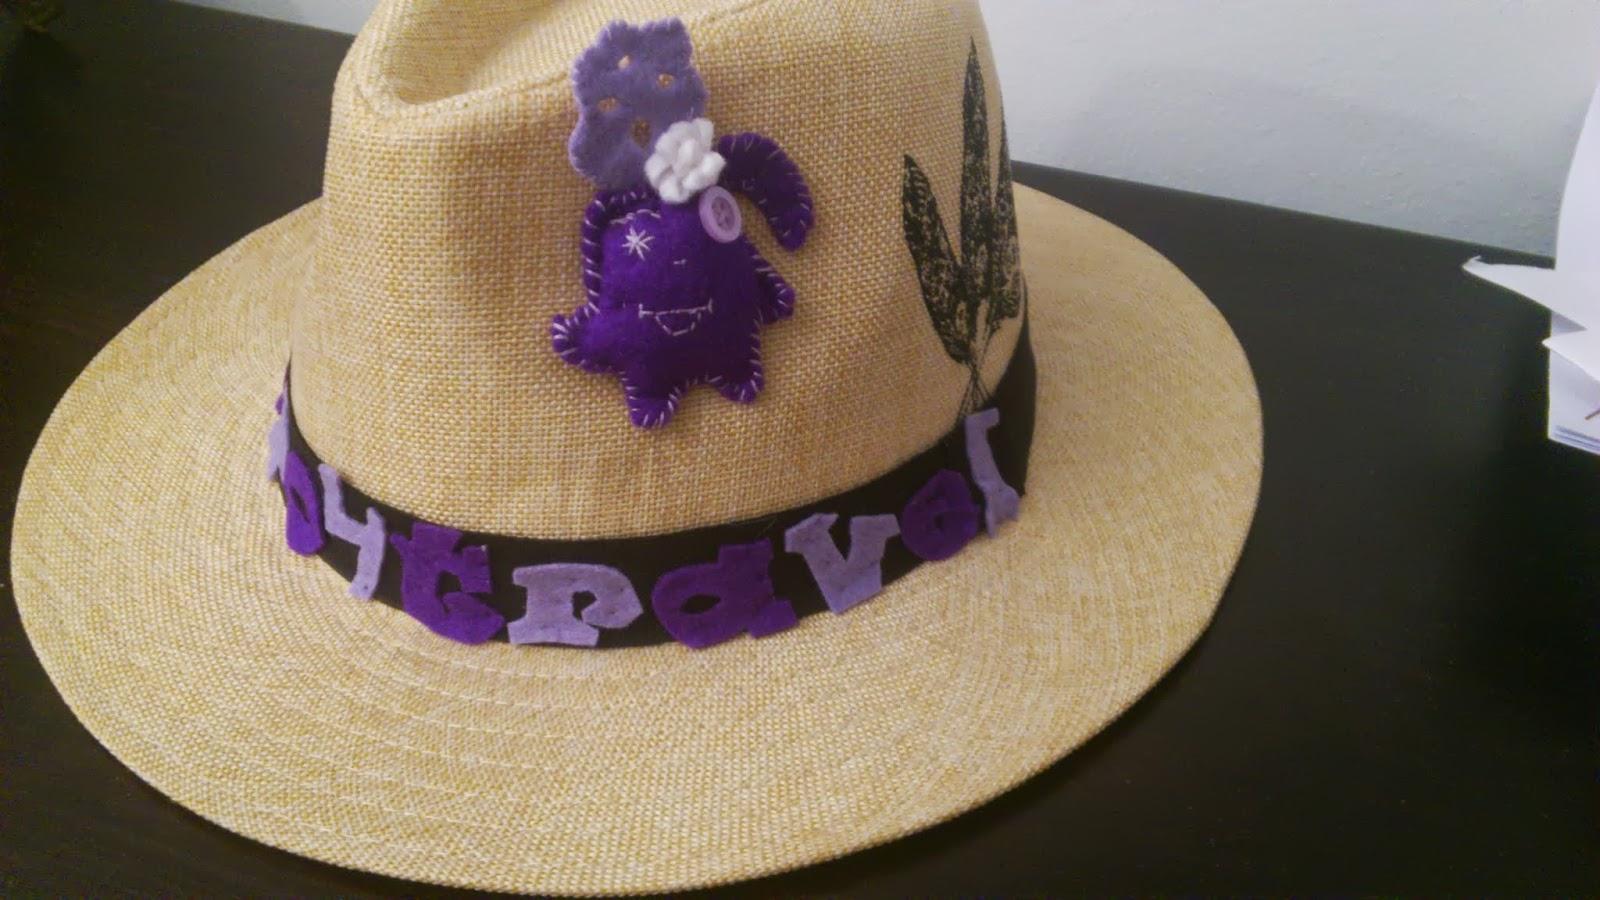 c mo decorar un sombrero en fieltro vero4casa